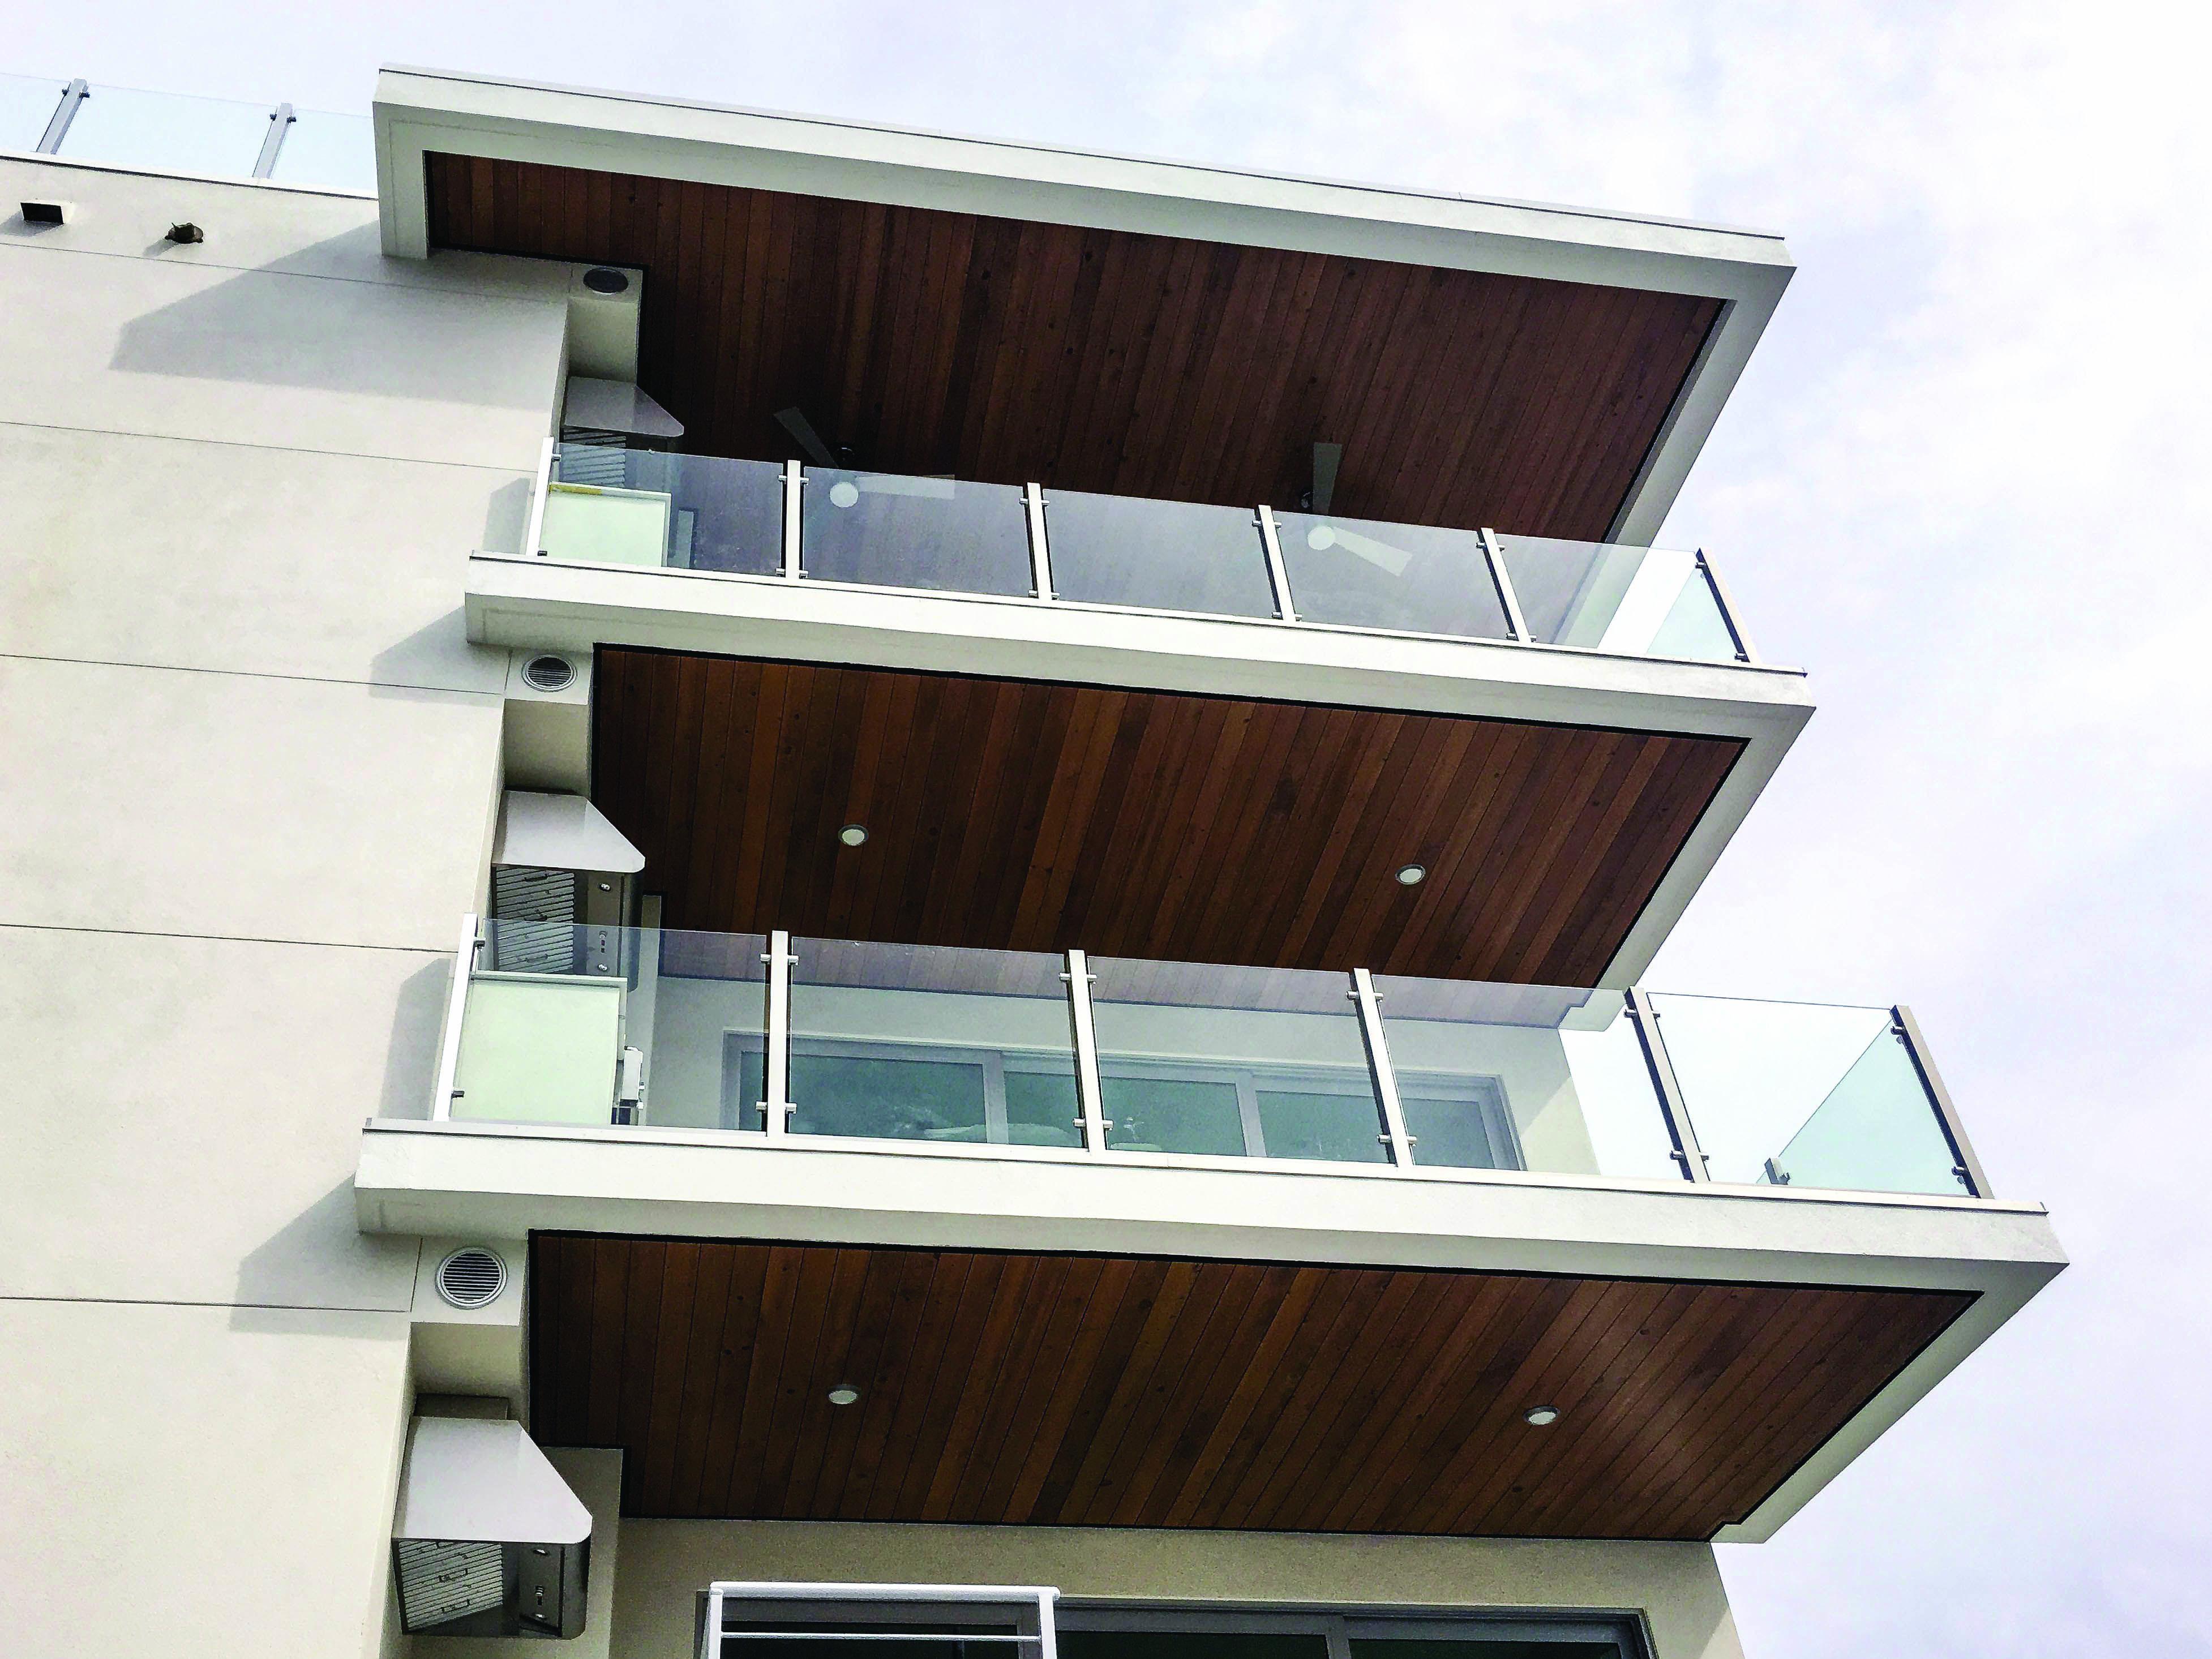 Balcony Railing Concepts Balcony railing, Glass and